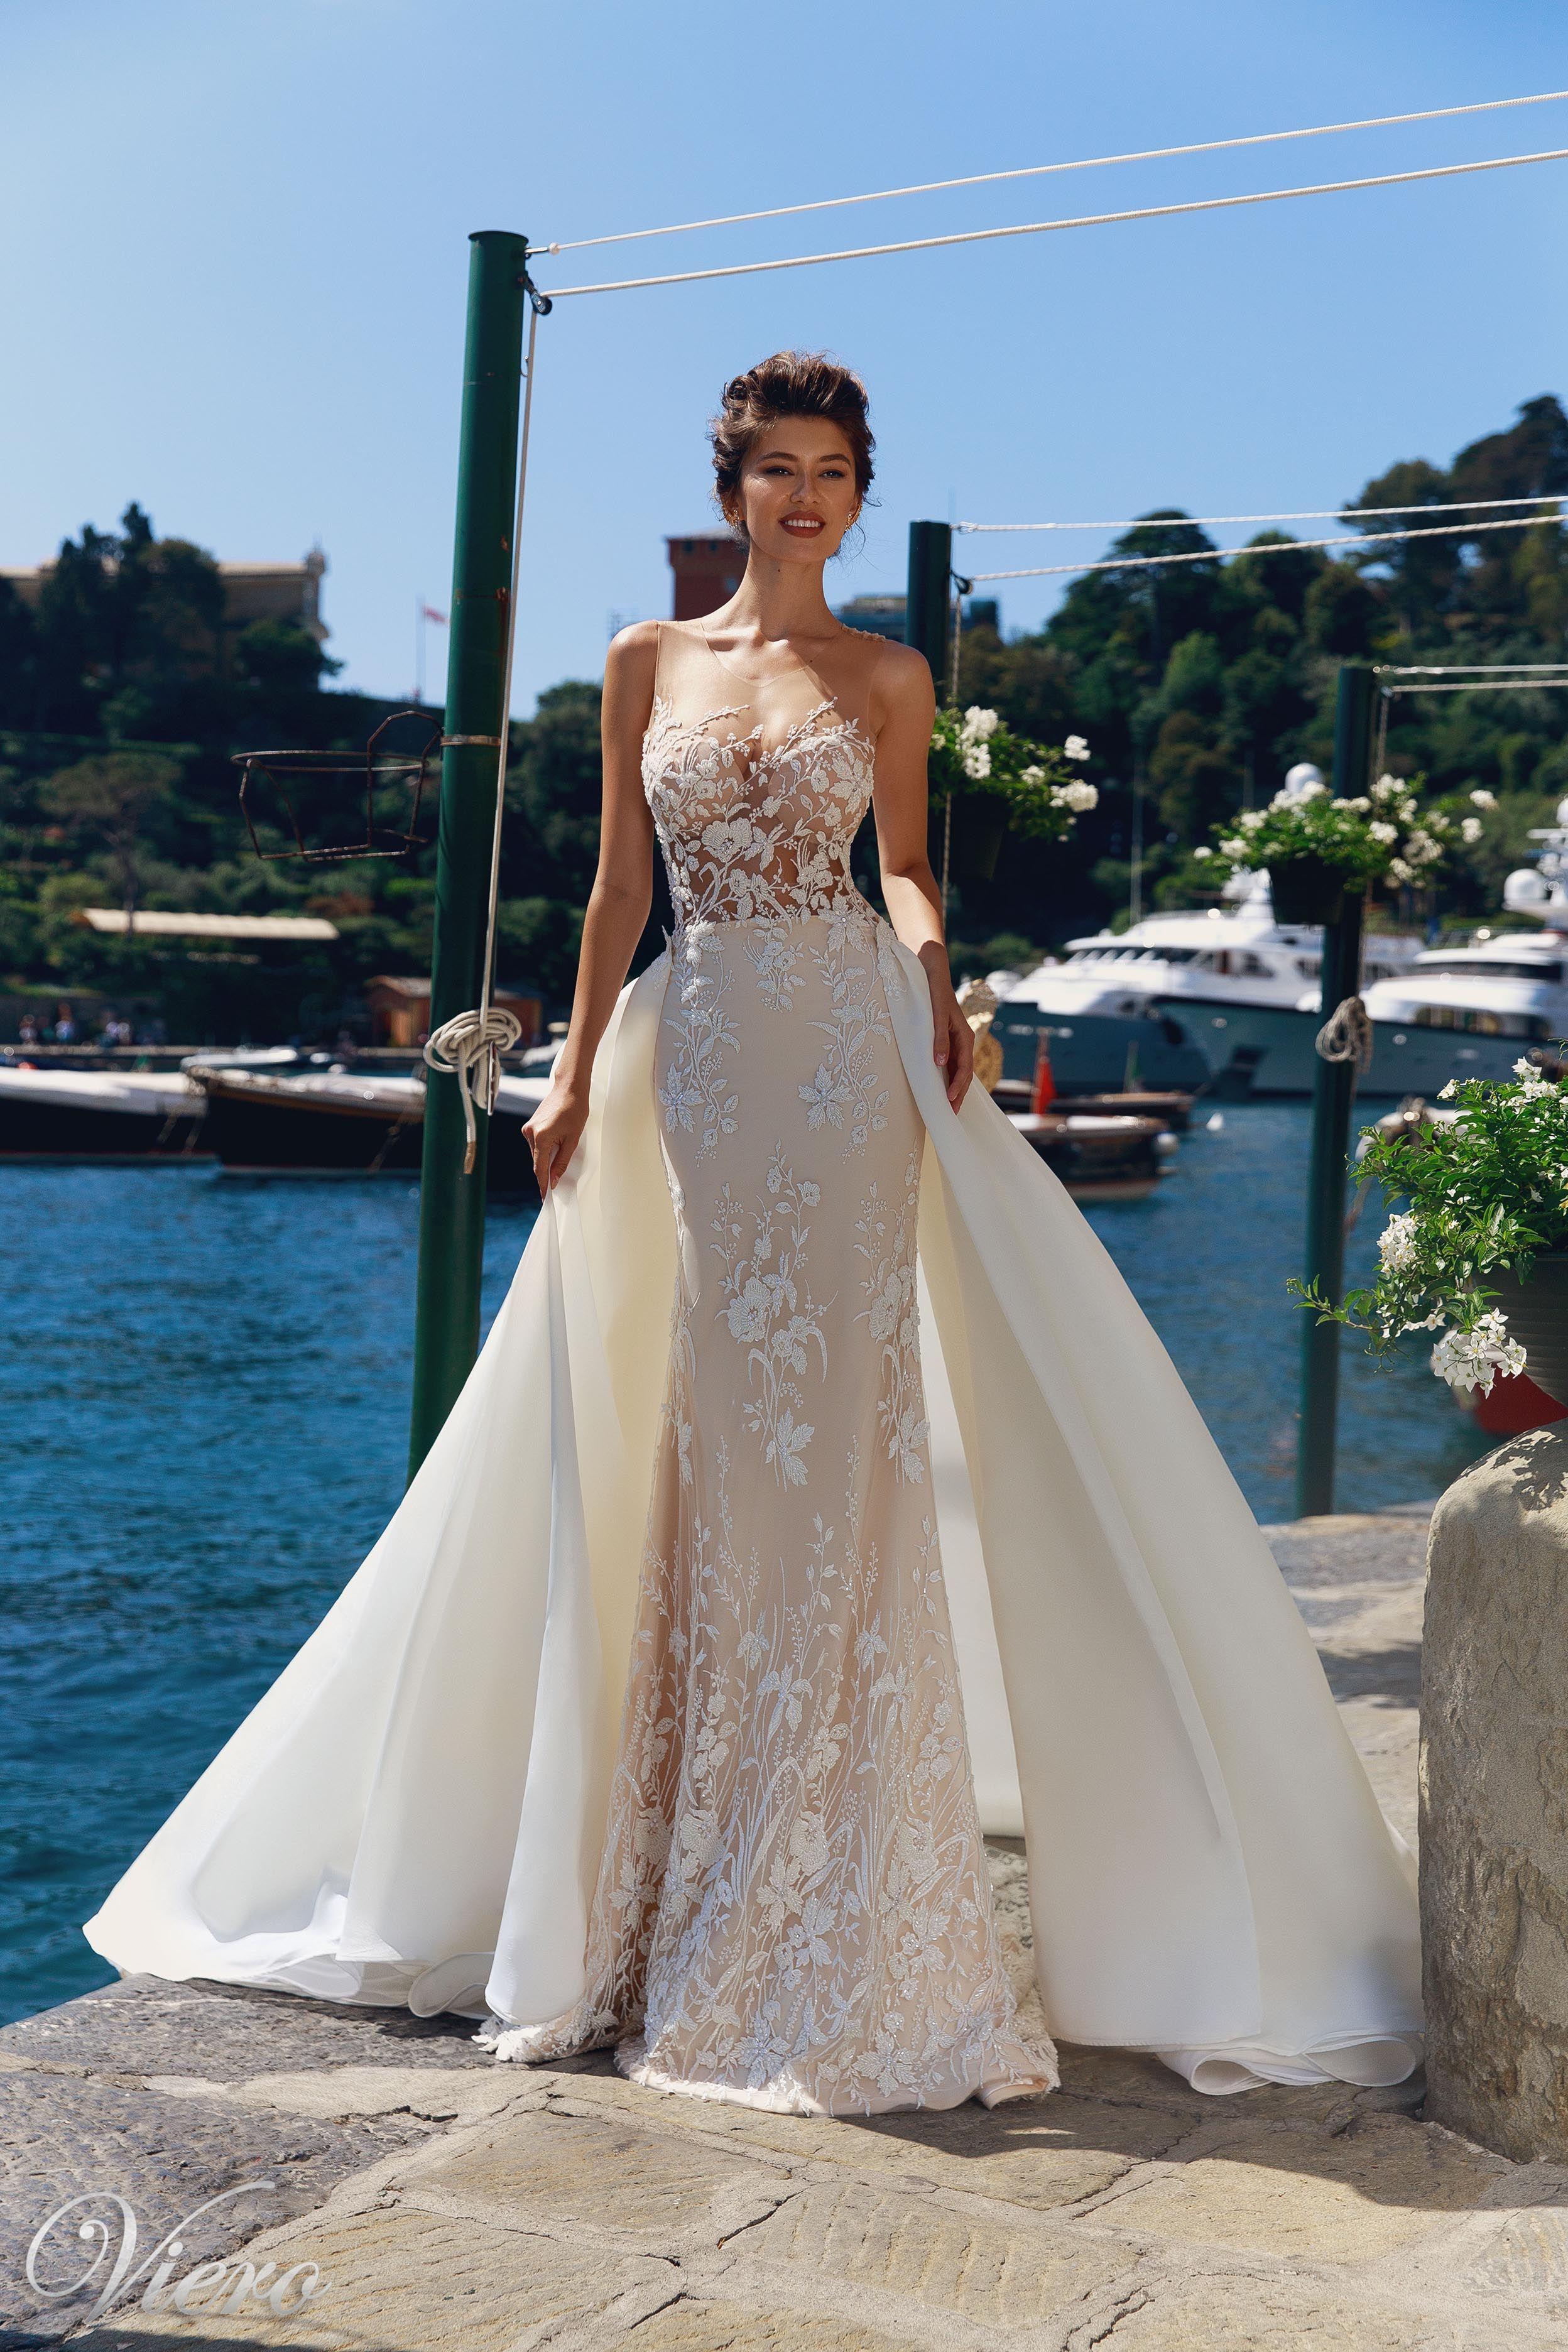 Valentina Weddingdress By Viero Weddingdress Dress Hautecouture Couture Gown Love Ido Bride Bri Bridal Wedding Dresses Bridal Dresses Wedding Dresses